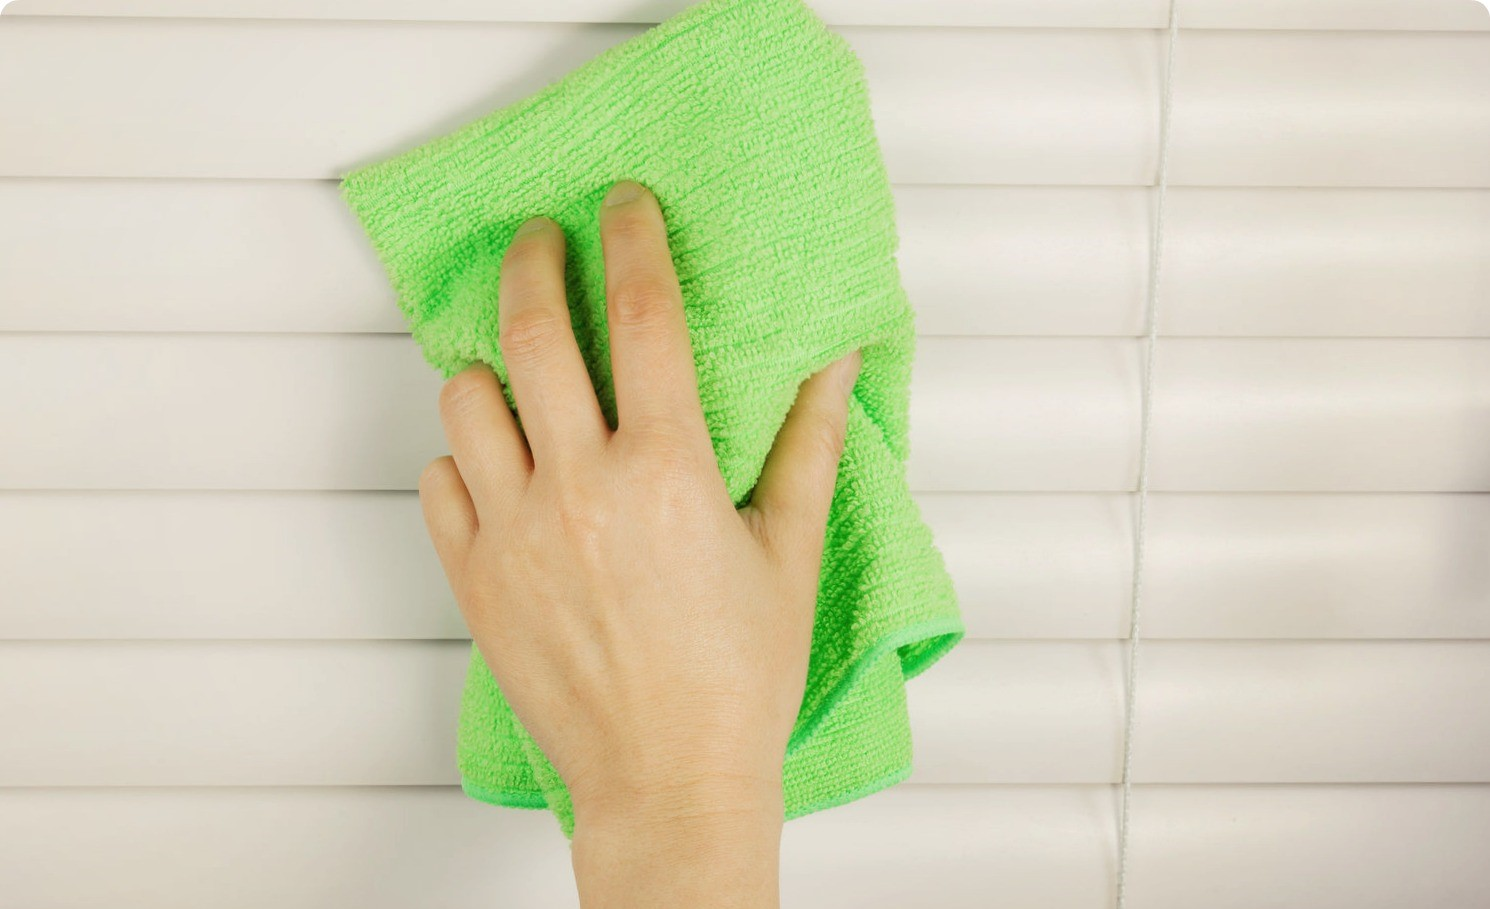 Мытье жалюзи